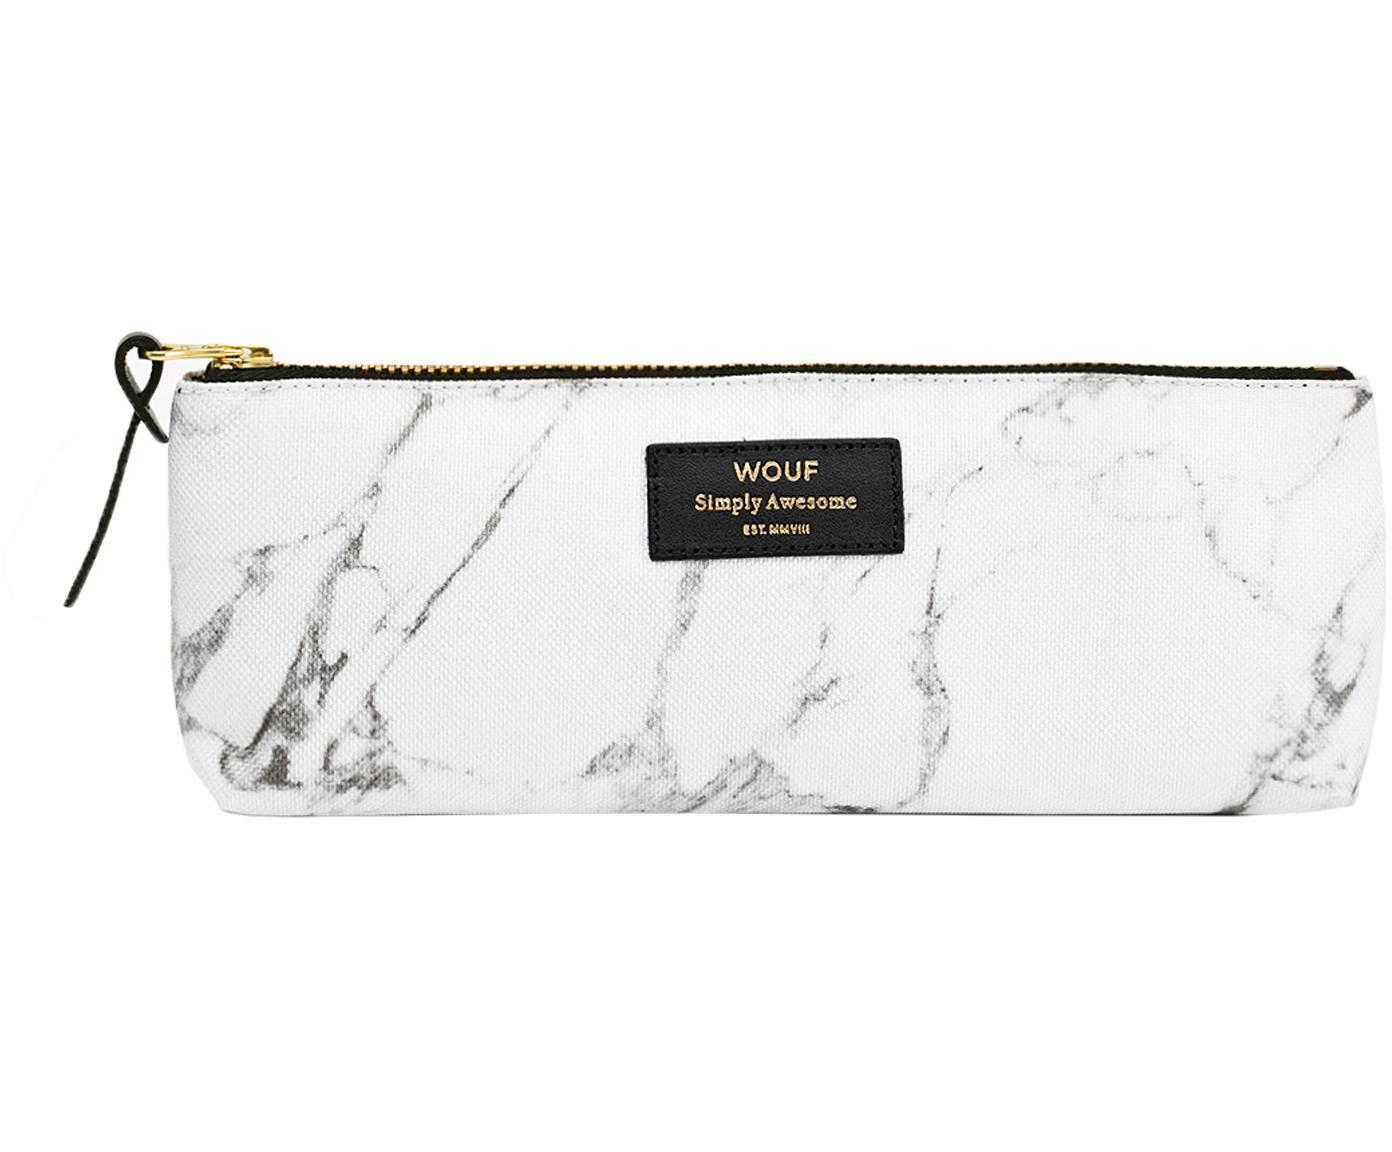 Astuccio per penne White Marble, Poliestere, pelle, Bianco, Larg. 22 x Alt. 9 cm